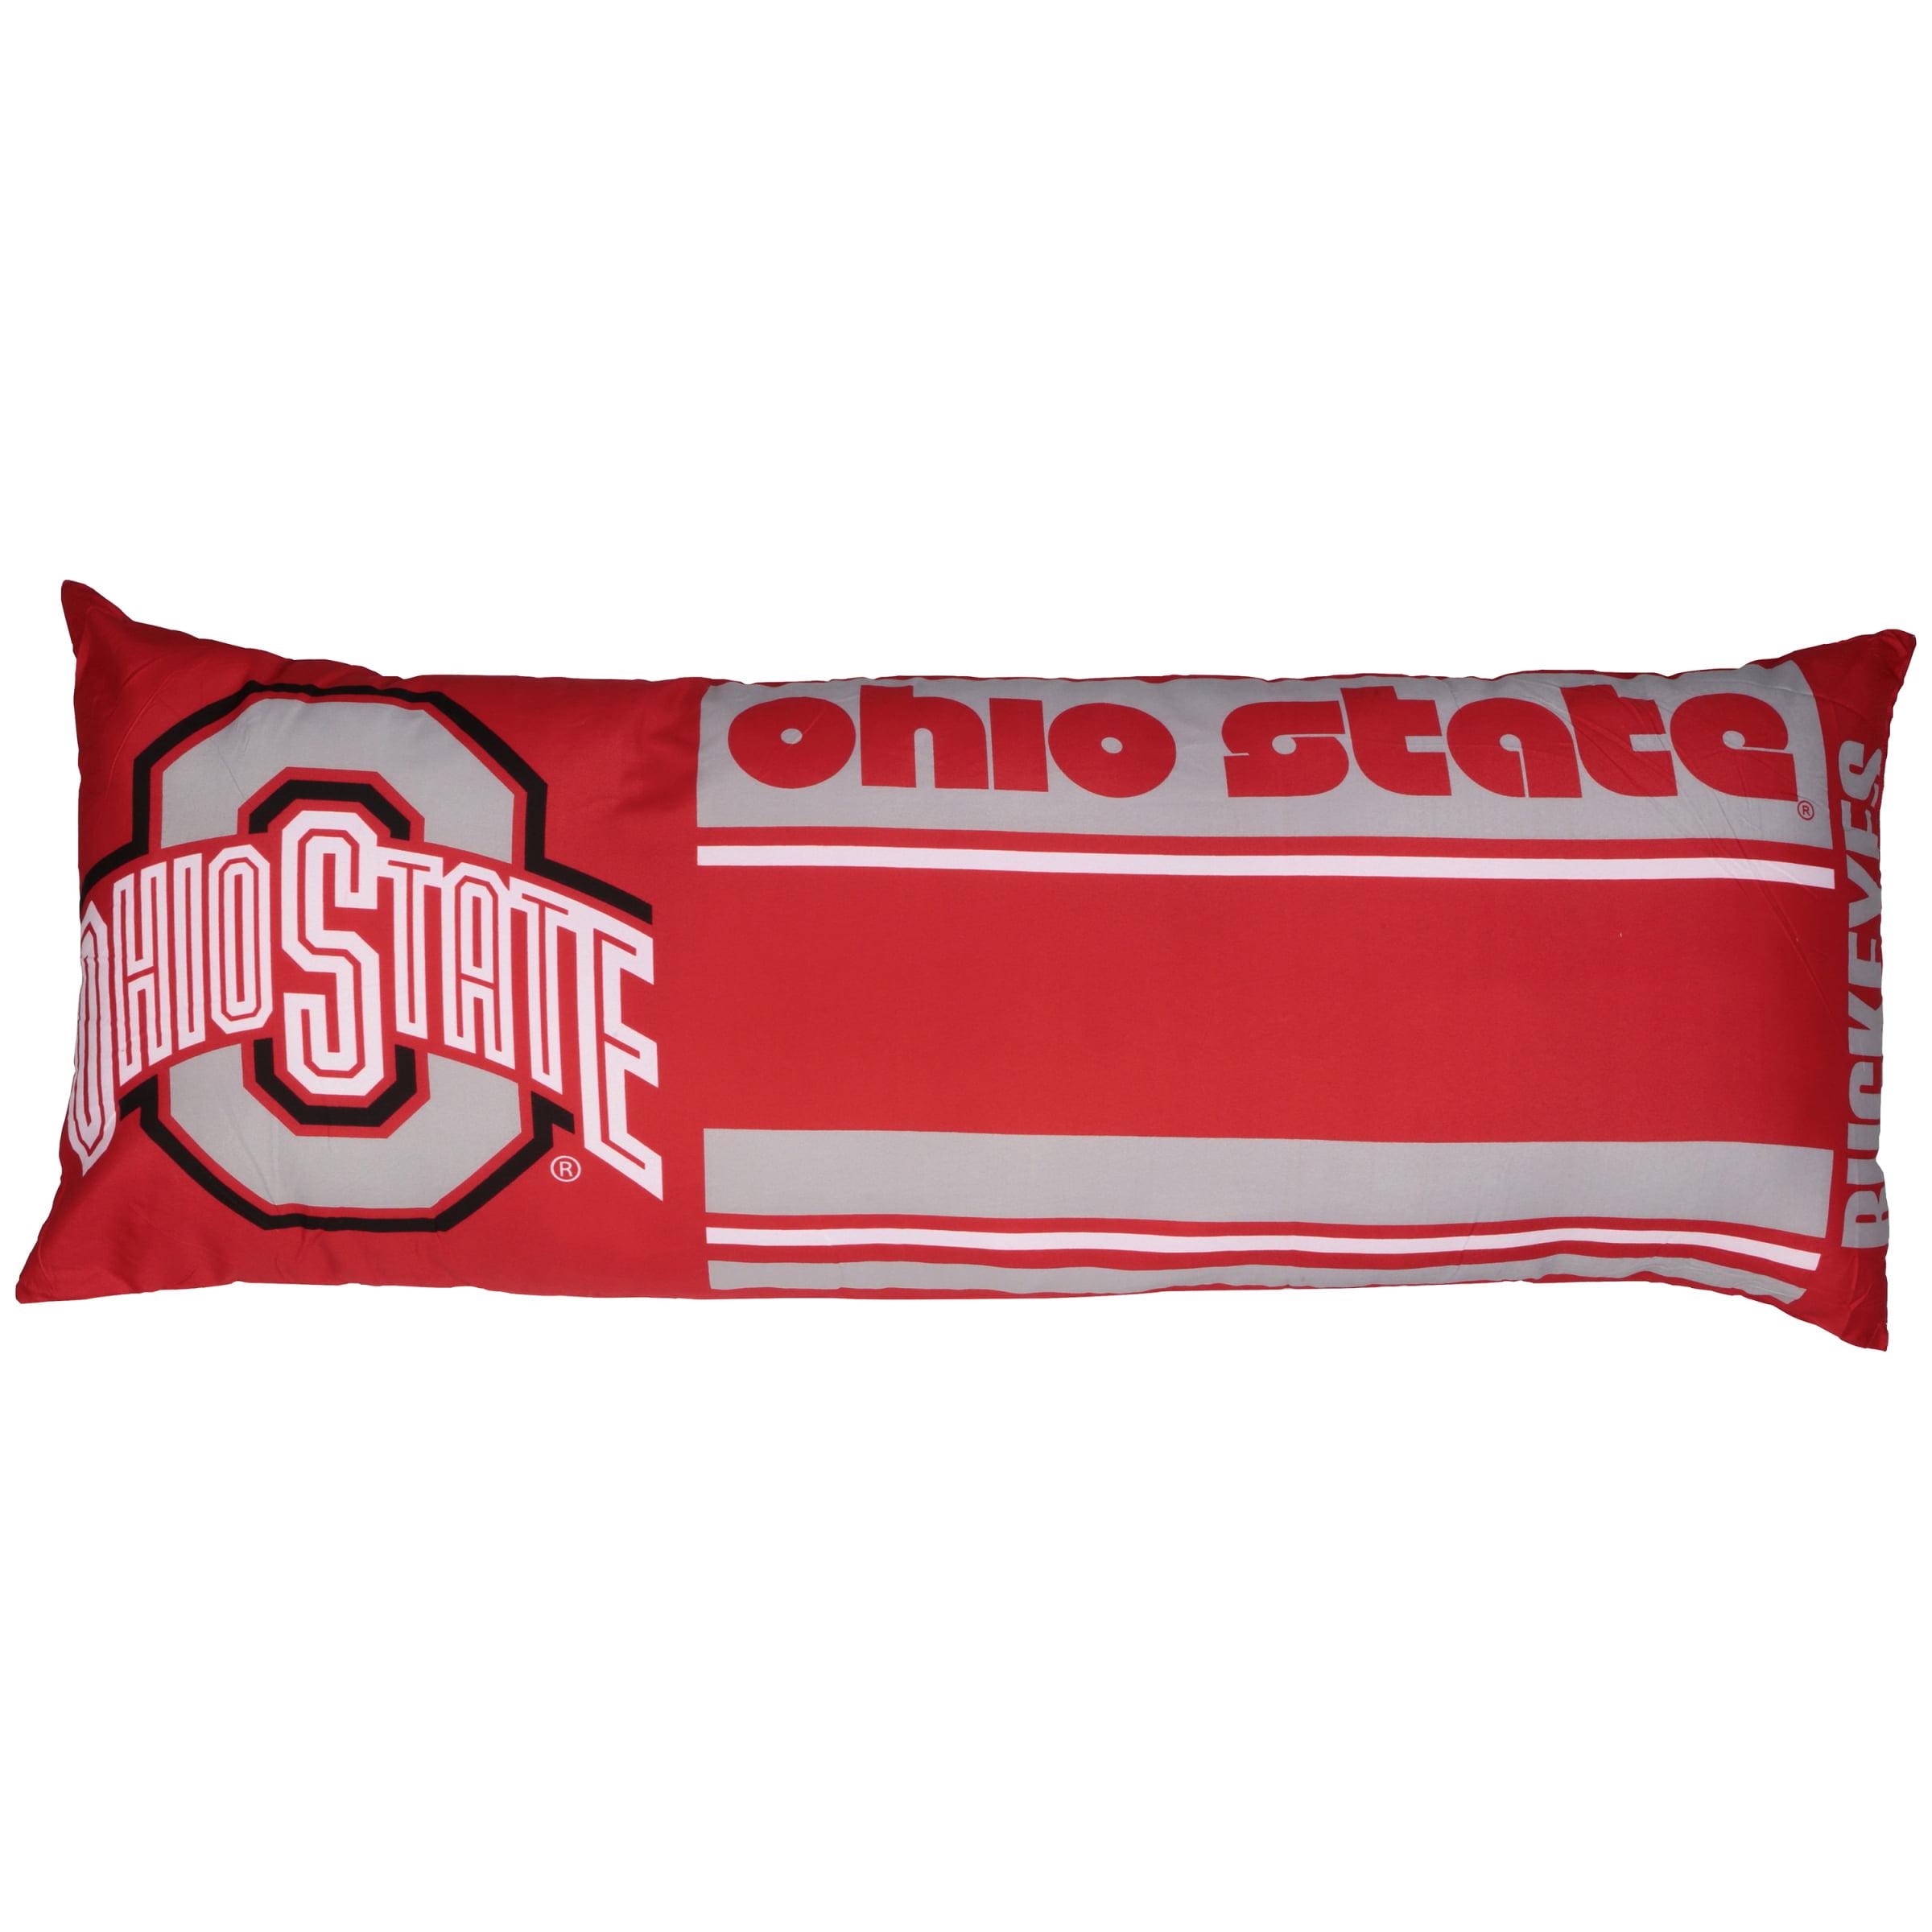 NCAA Northwest™ Ohio State® Buckeyes Body Pillow